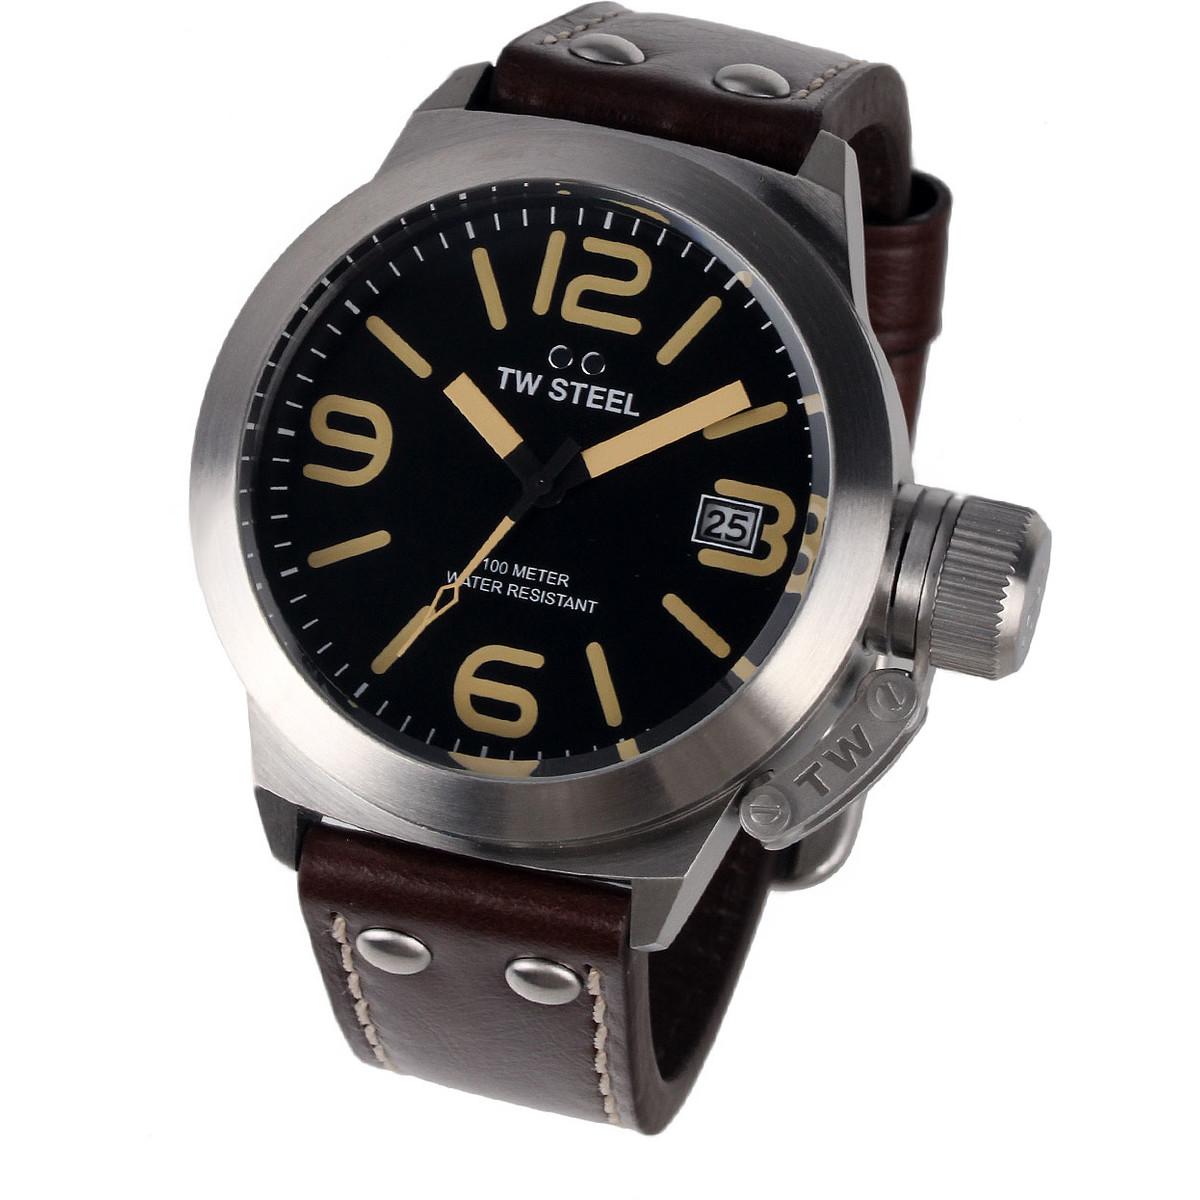 Ceas barbatesc TW-Steel CS31 Canteen Leather de mana original